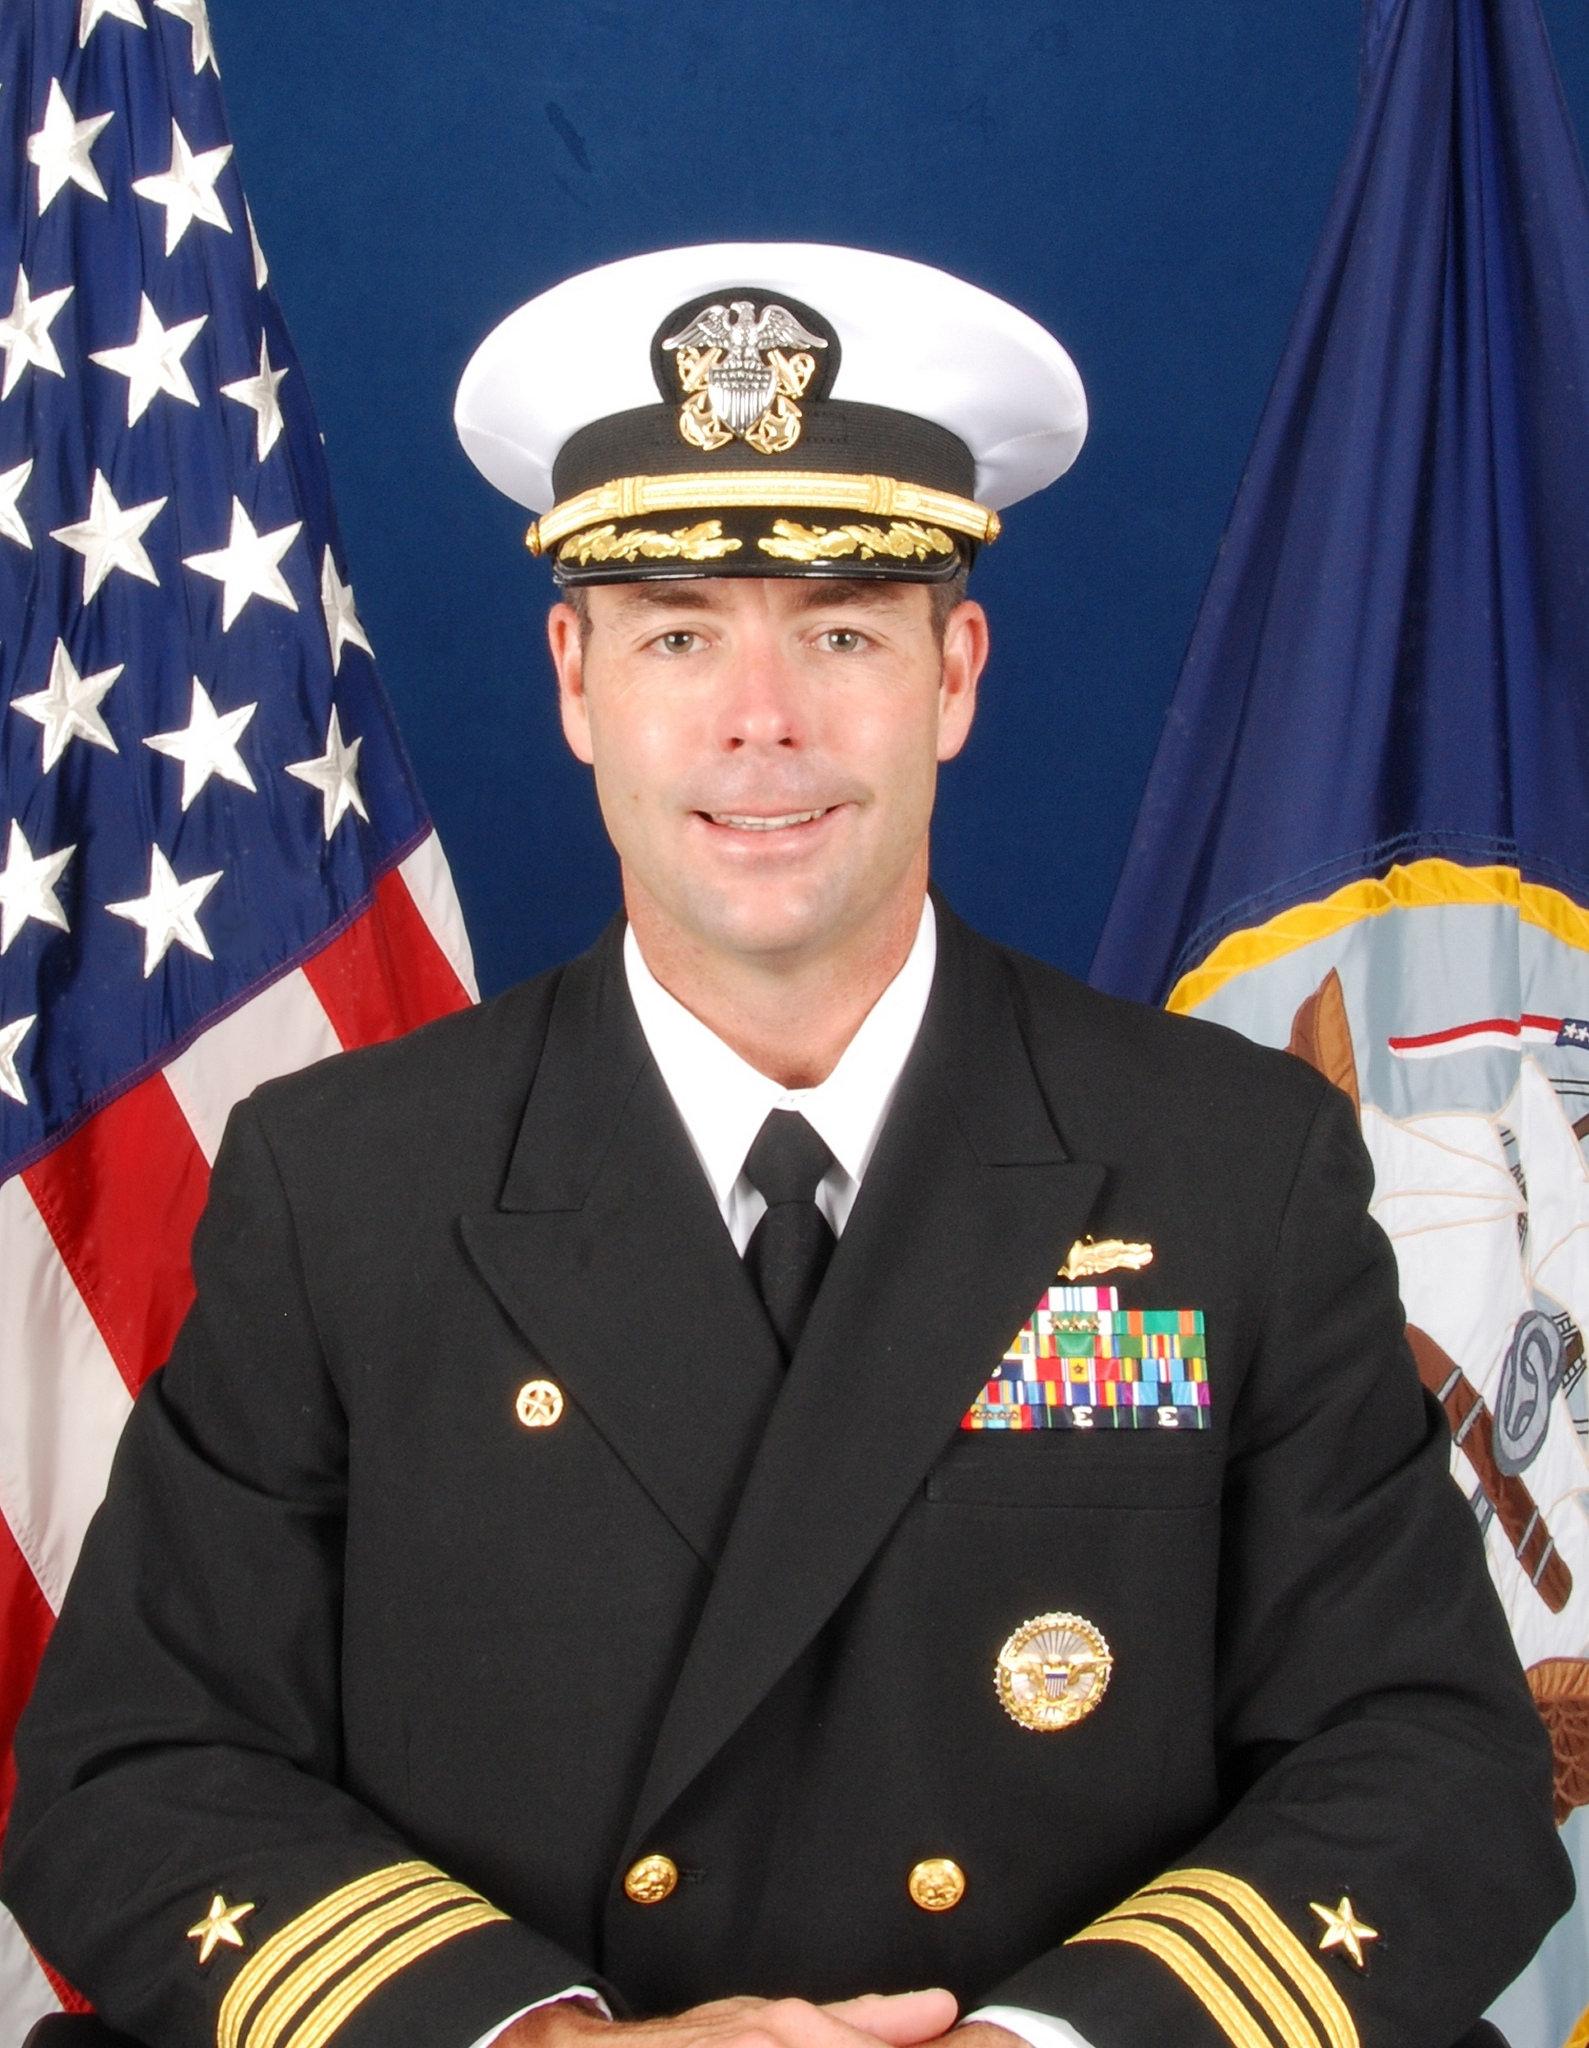 Boca Raton Native Dennis Farrell Leaves Command Of Uss